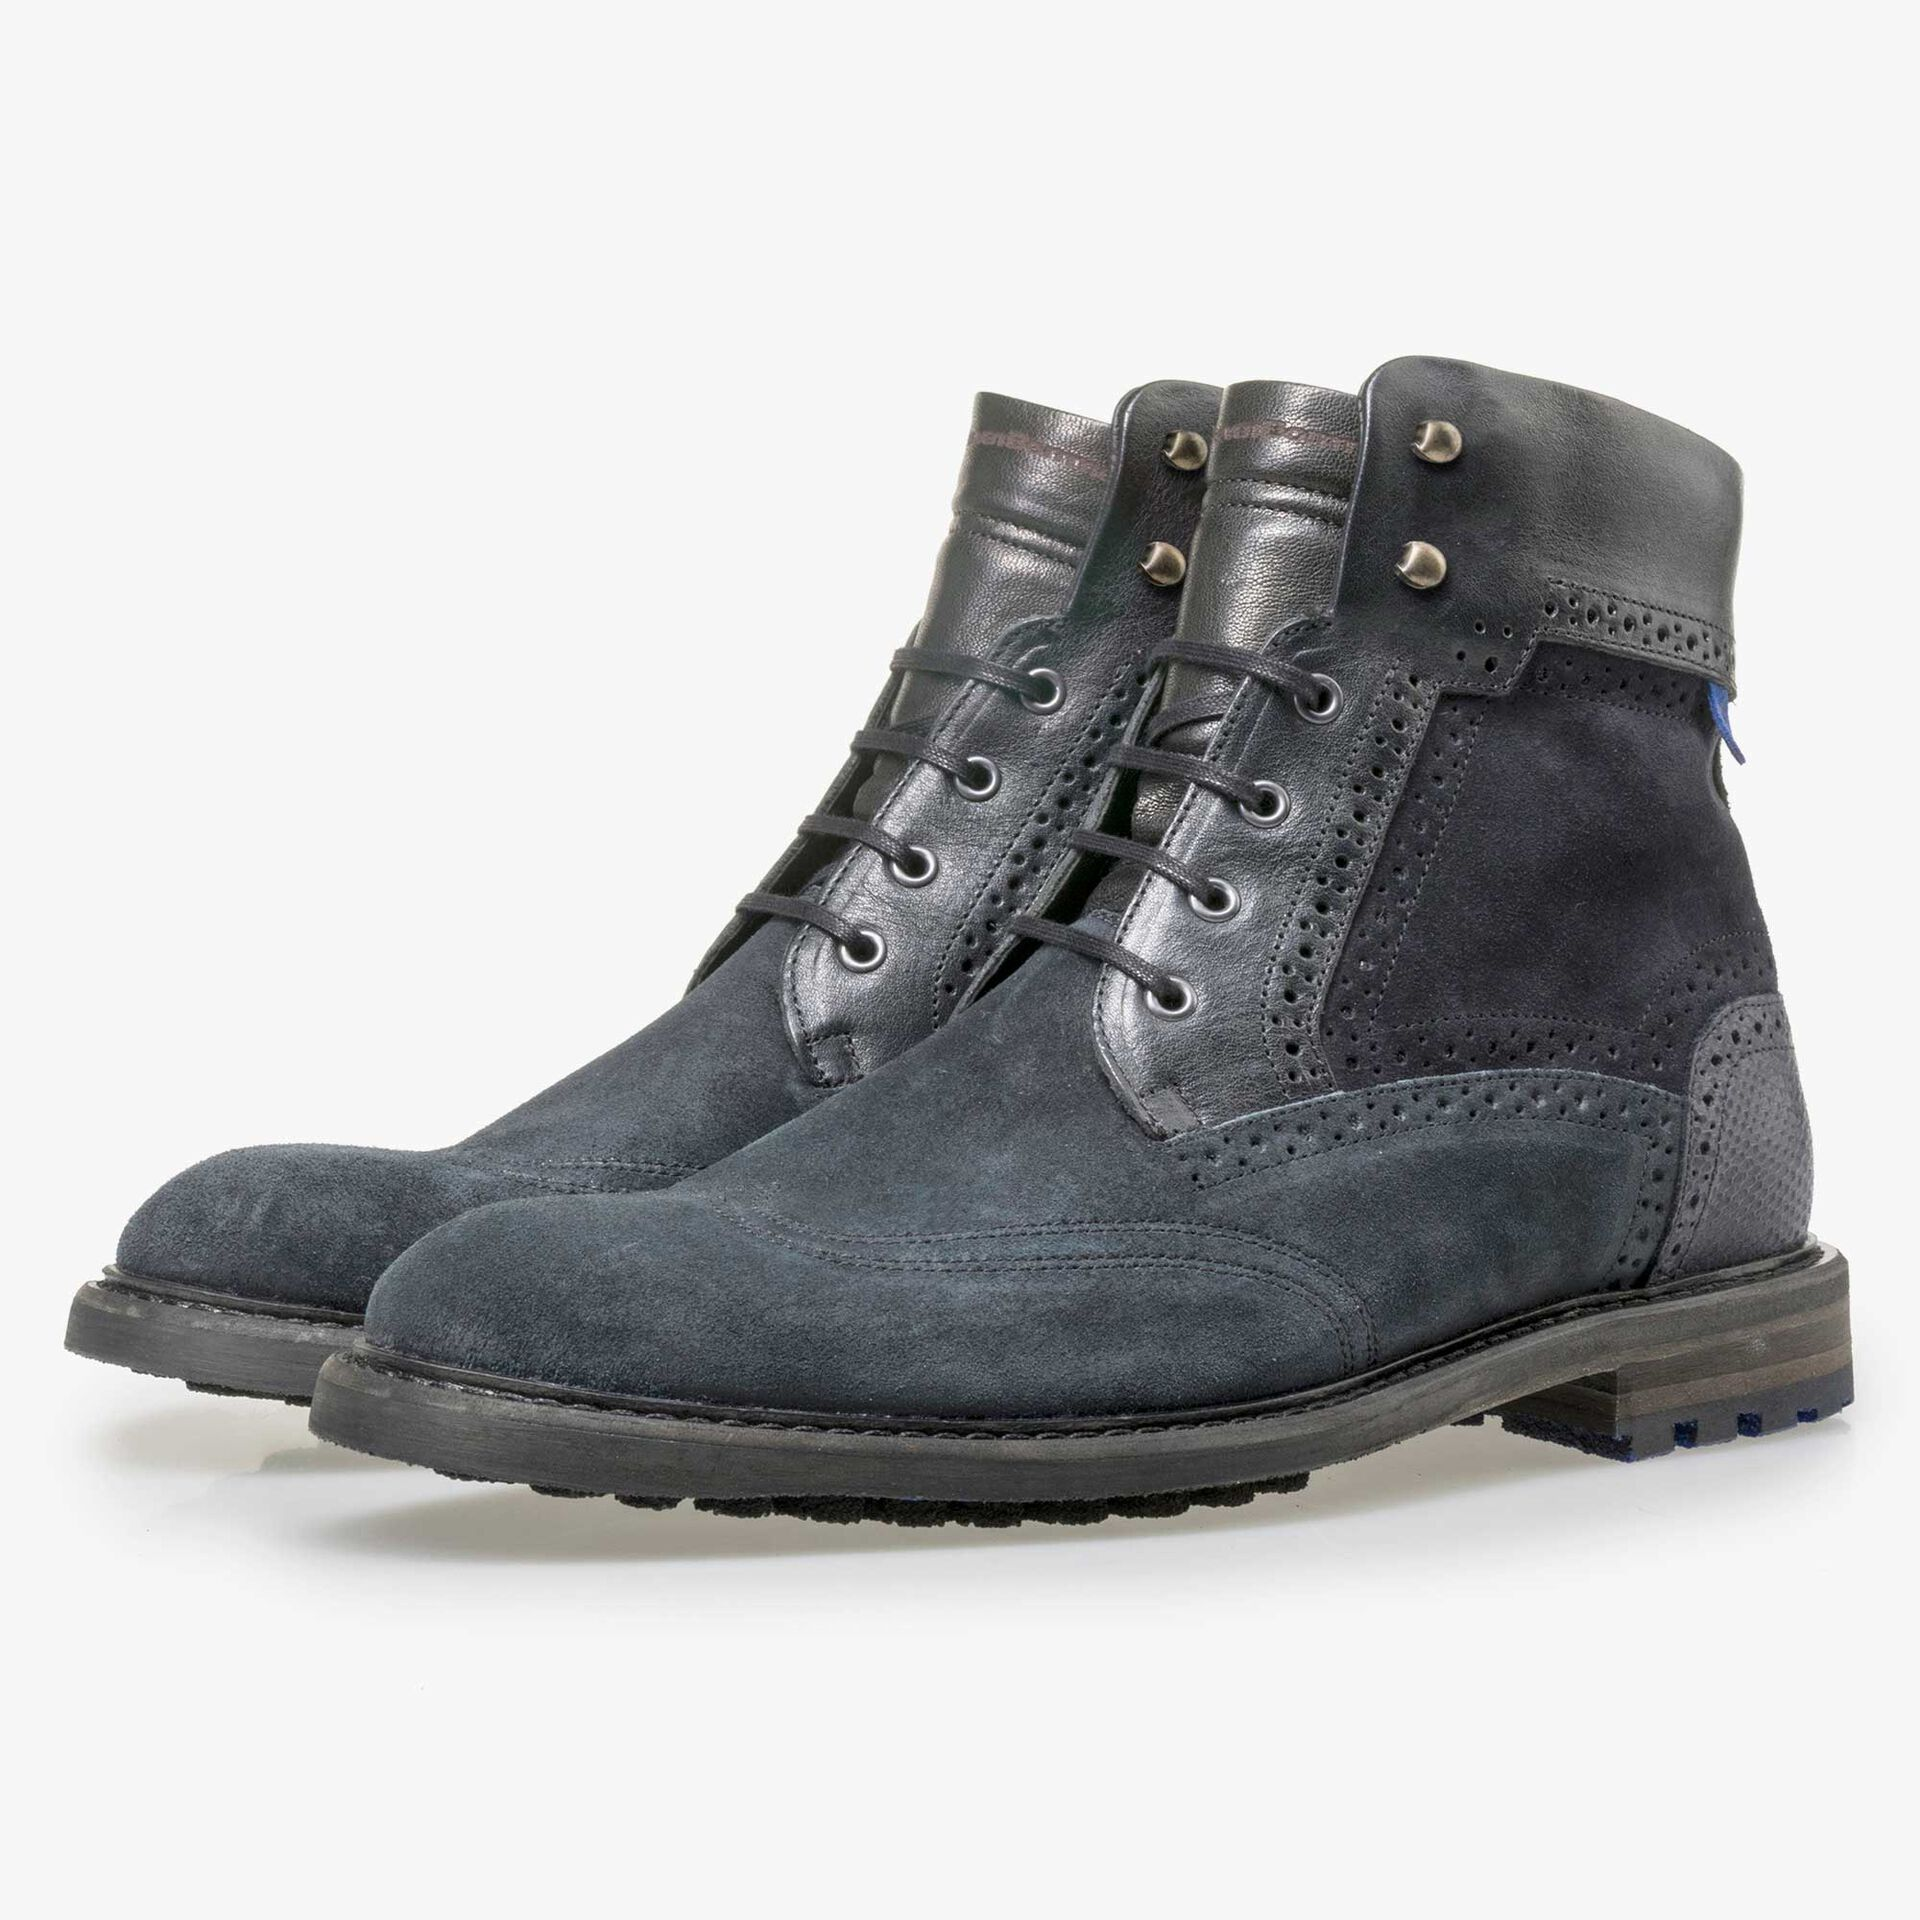 Floris van Bommel dark blue high suede leather lace boot